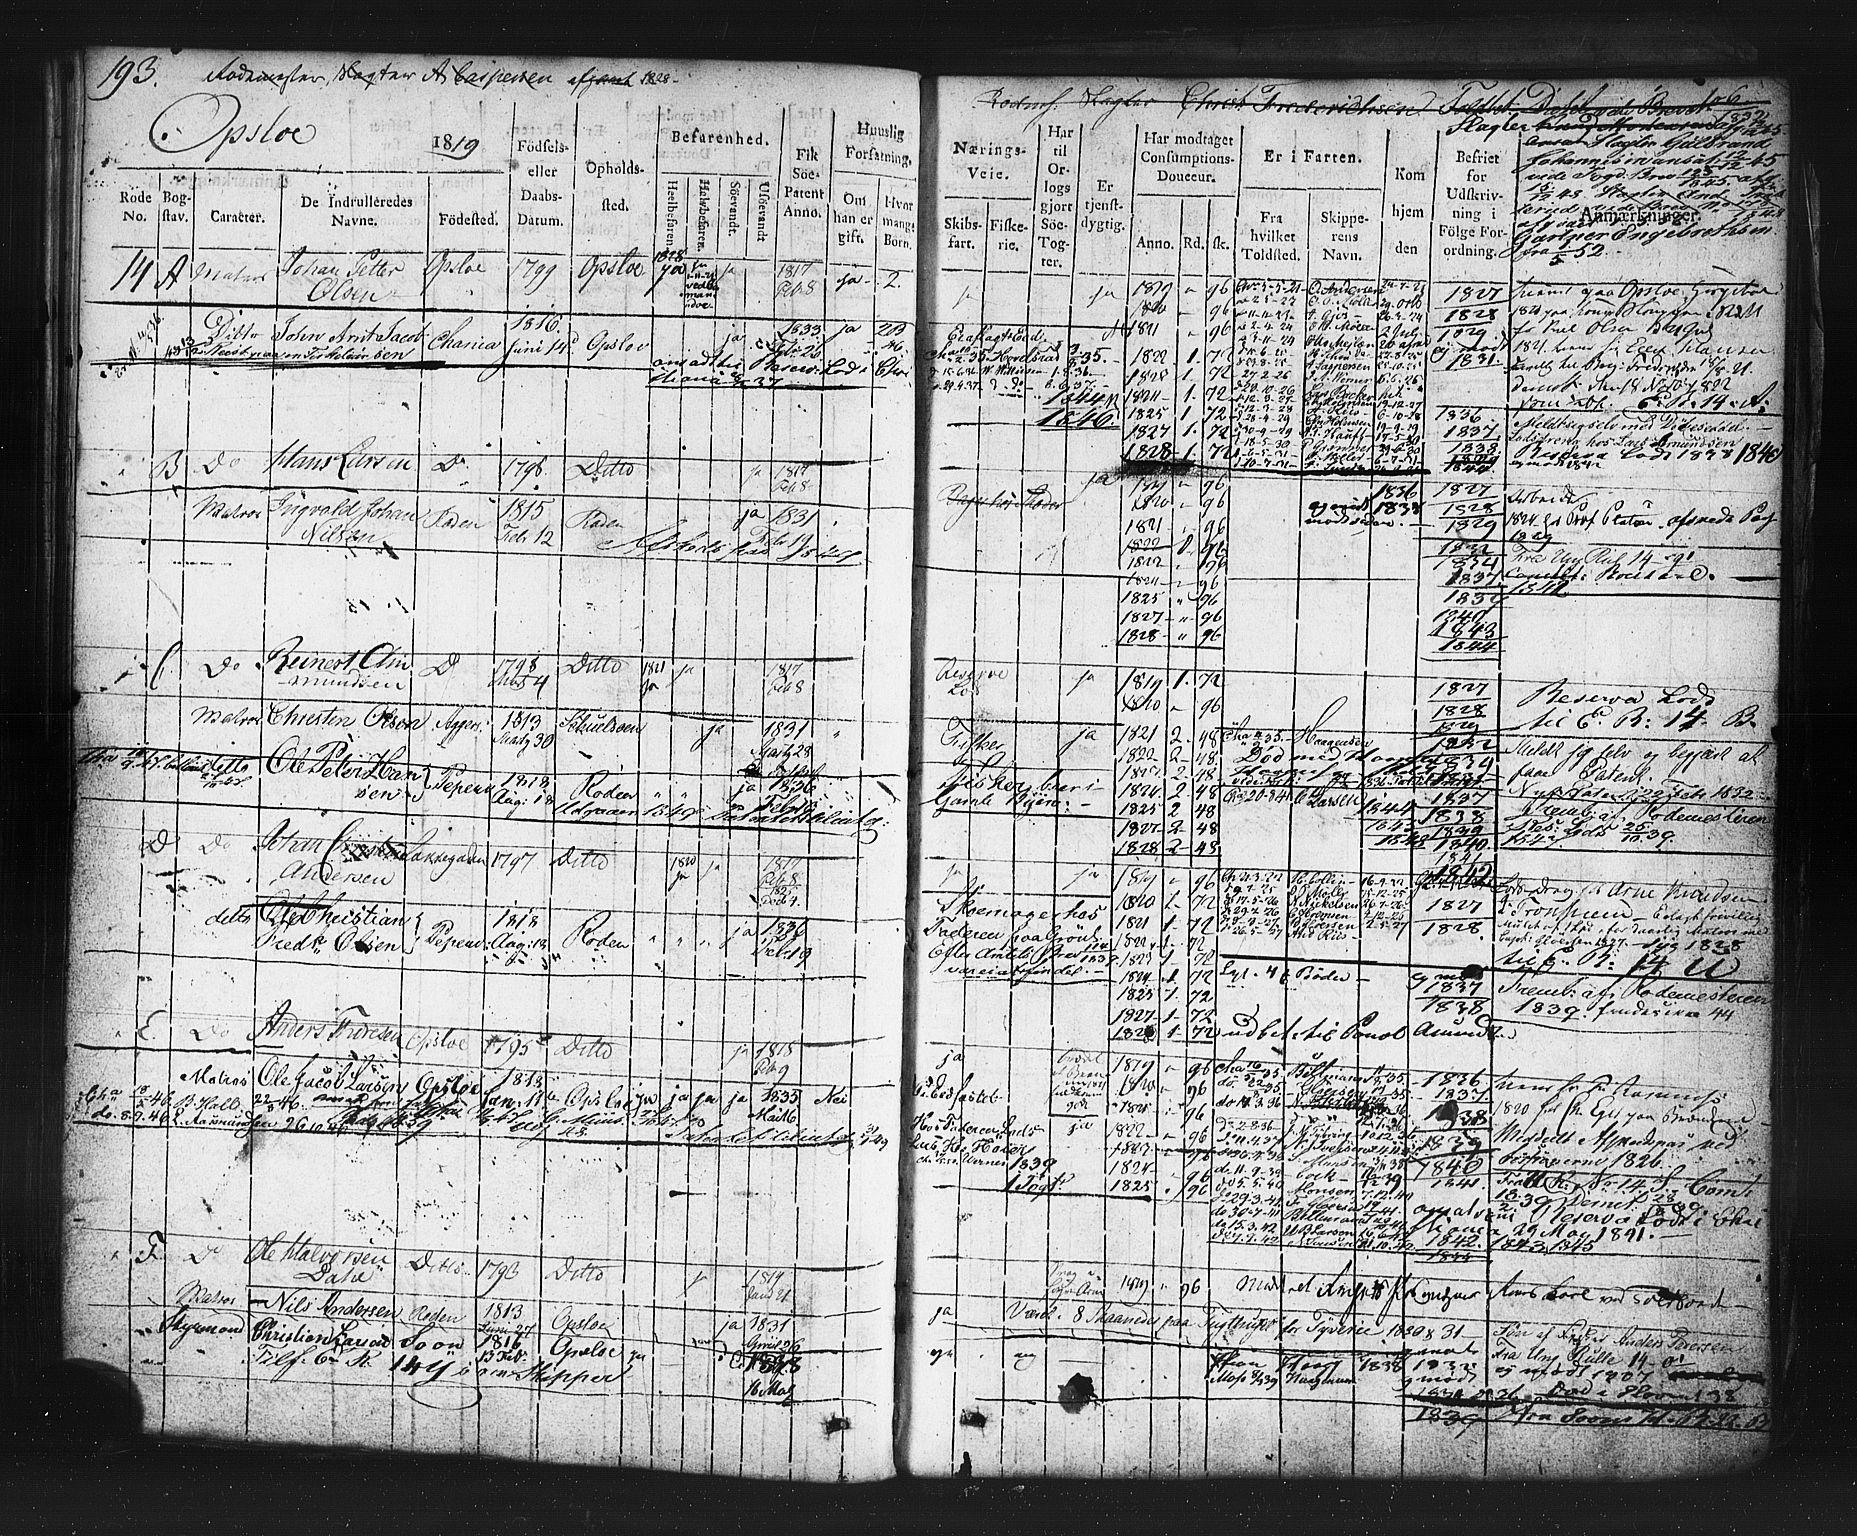 SAO, Oslo mønstringskontor, F/Fc/Fcb/L0001: Hovedrulle, 1819, s. 193